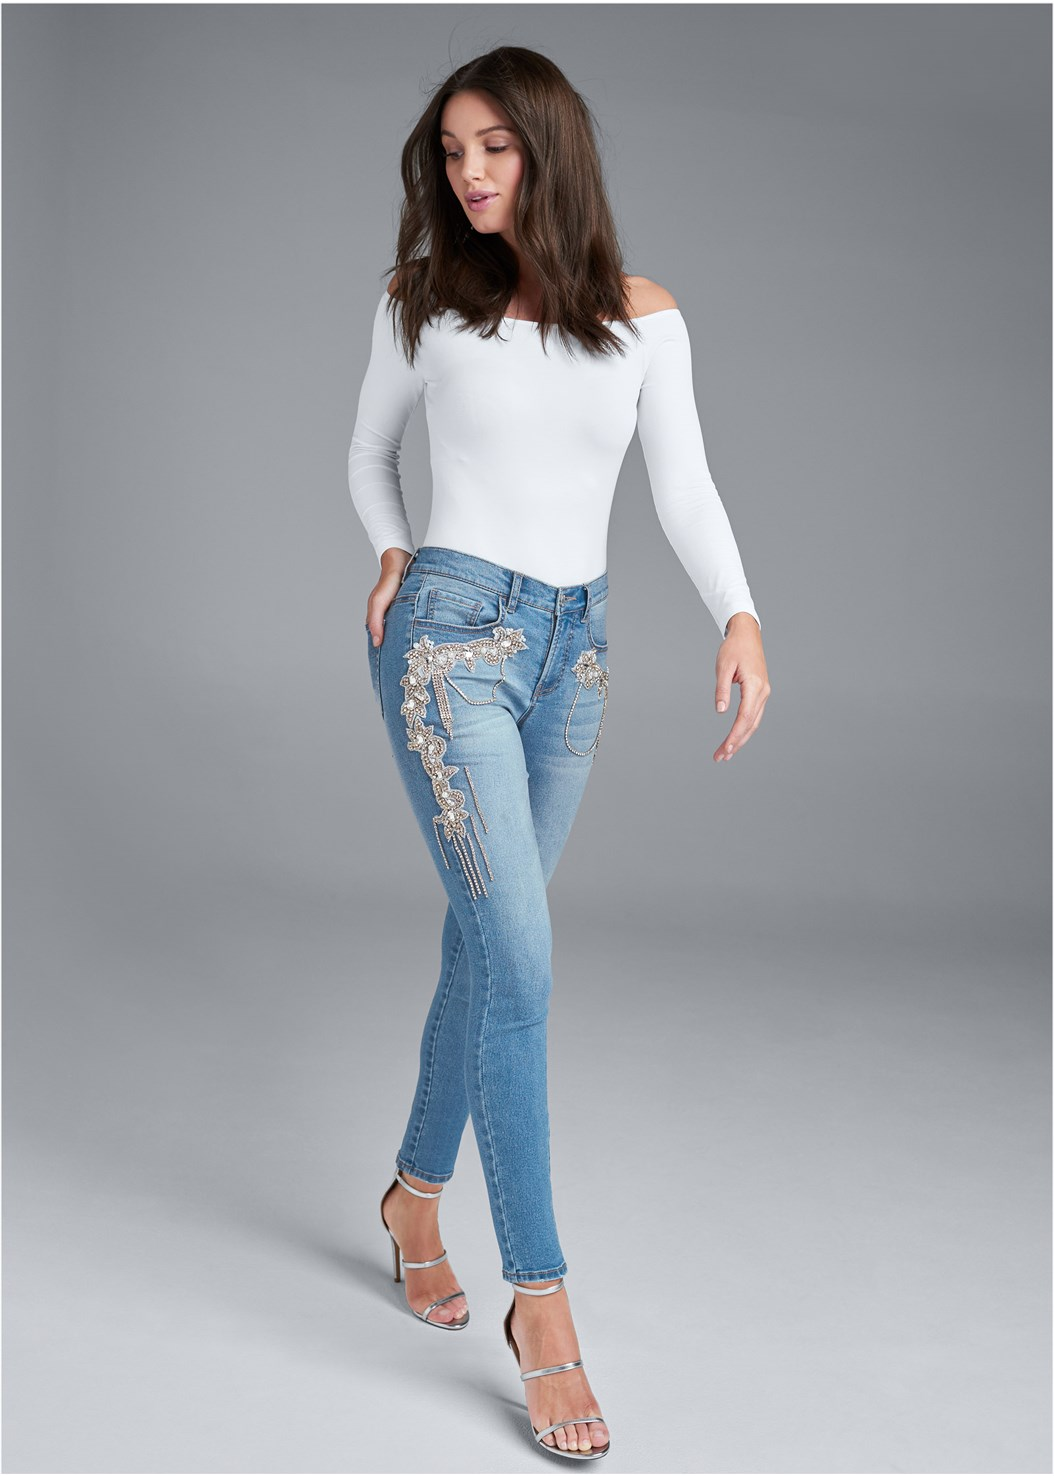 Crystal Embellished Skinny Jeans,Off The Shoulder Top,Full Figure Strapless Bra,High Heel Strappy Sandals